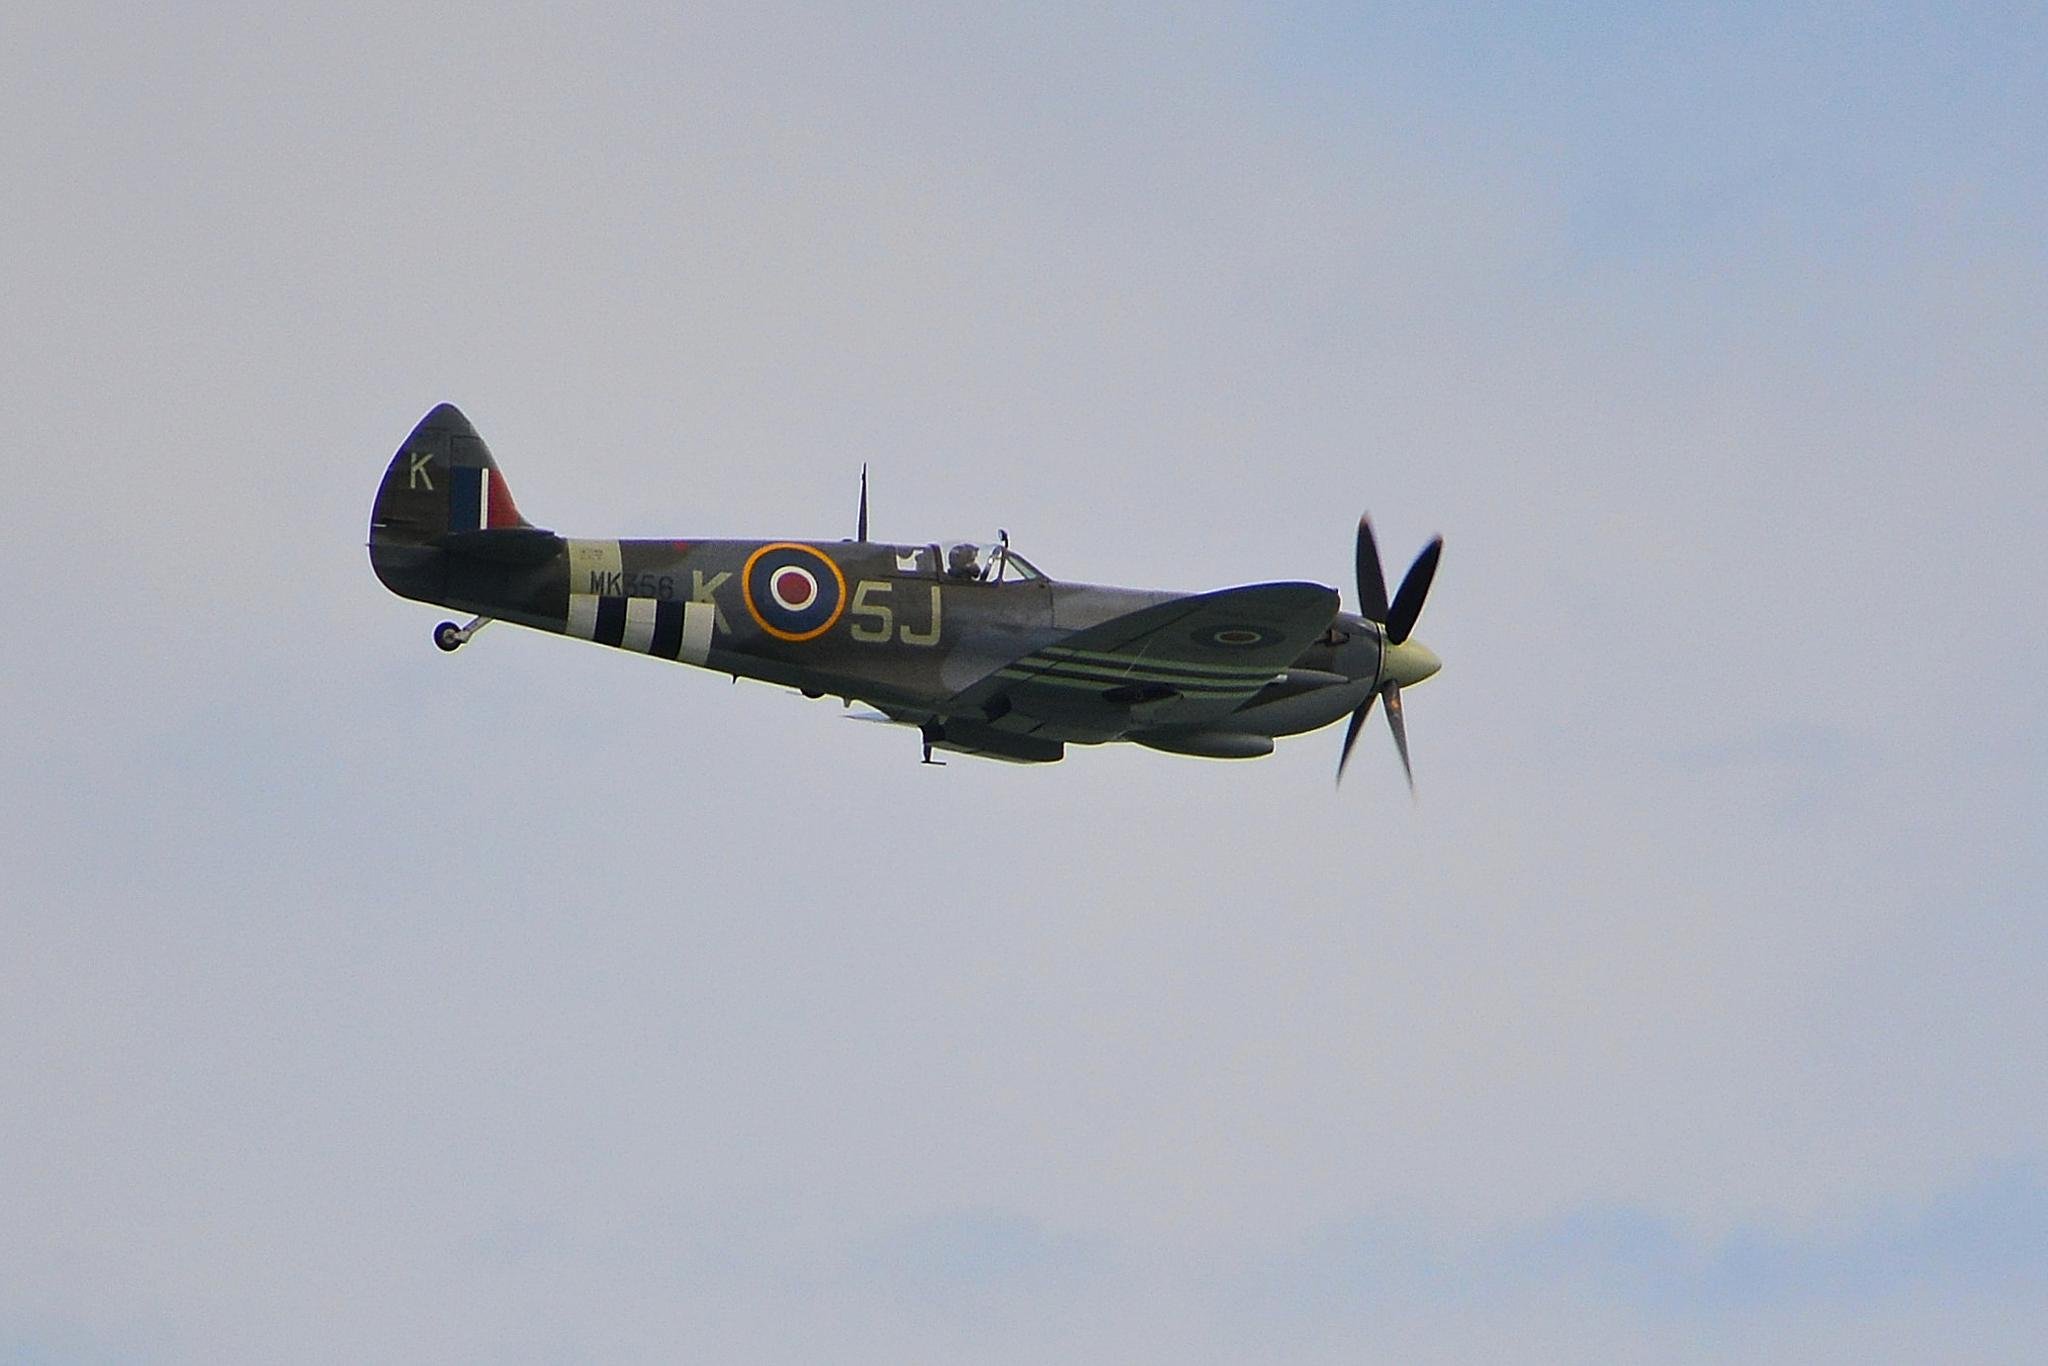 Spitfire by tim.wells.79